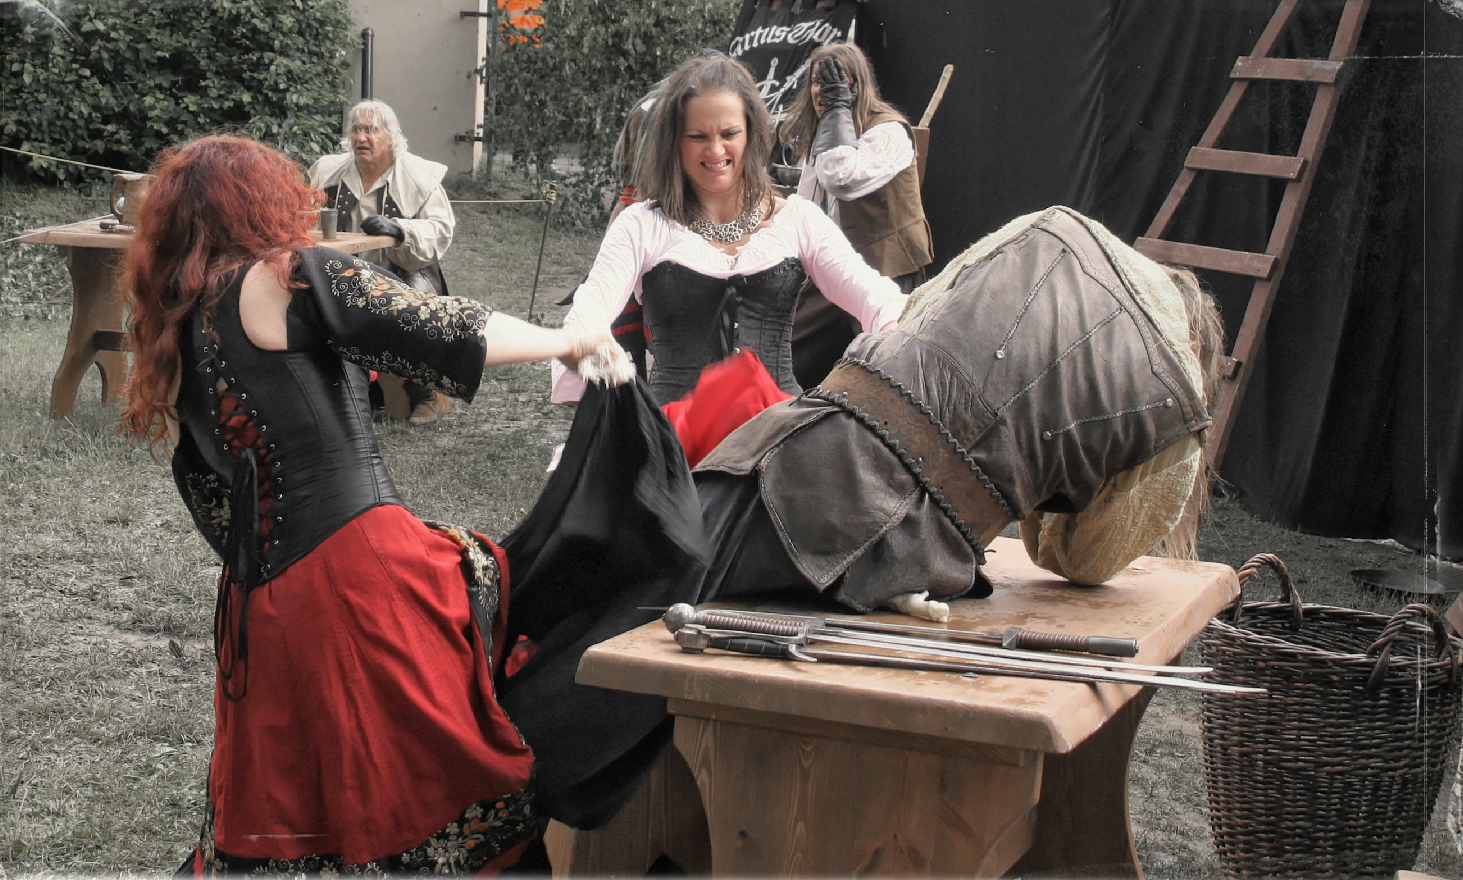 IMG_9265Schlossfest-Hainewalde-2016